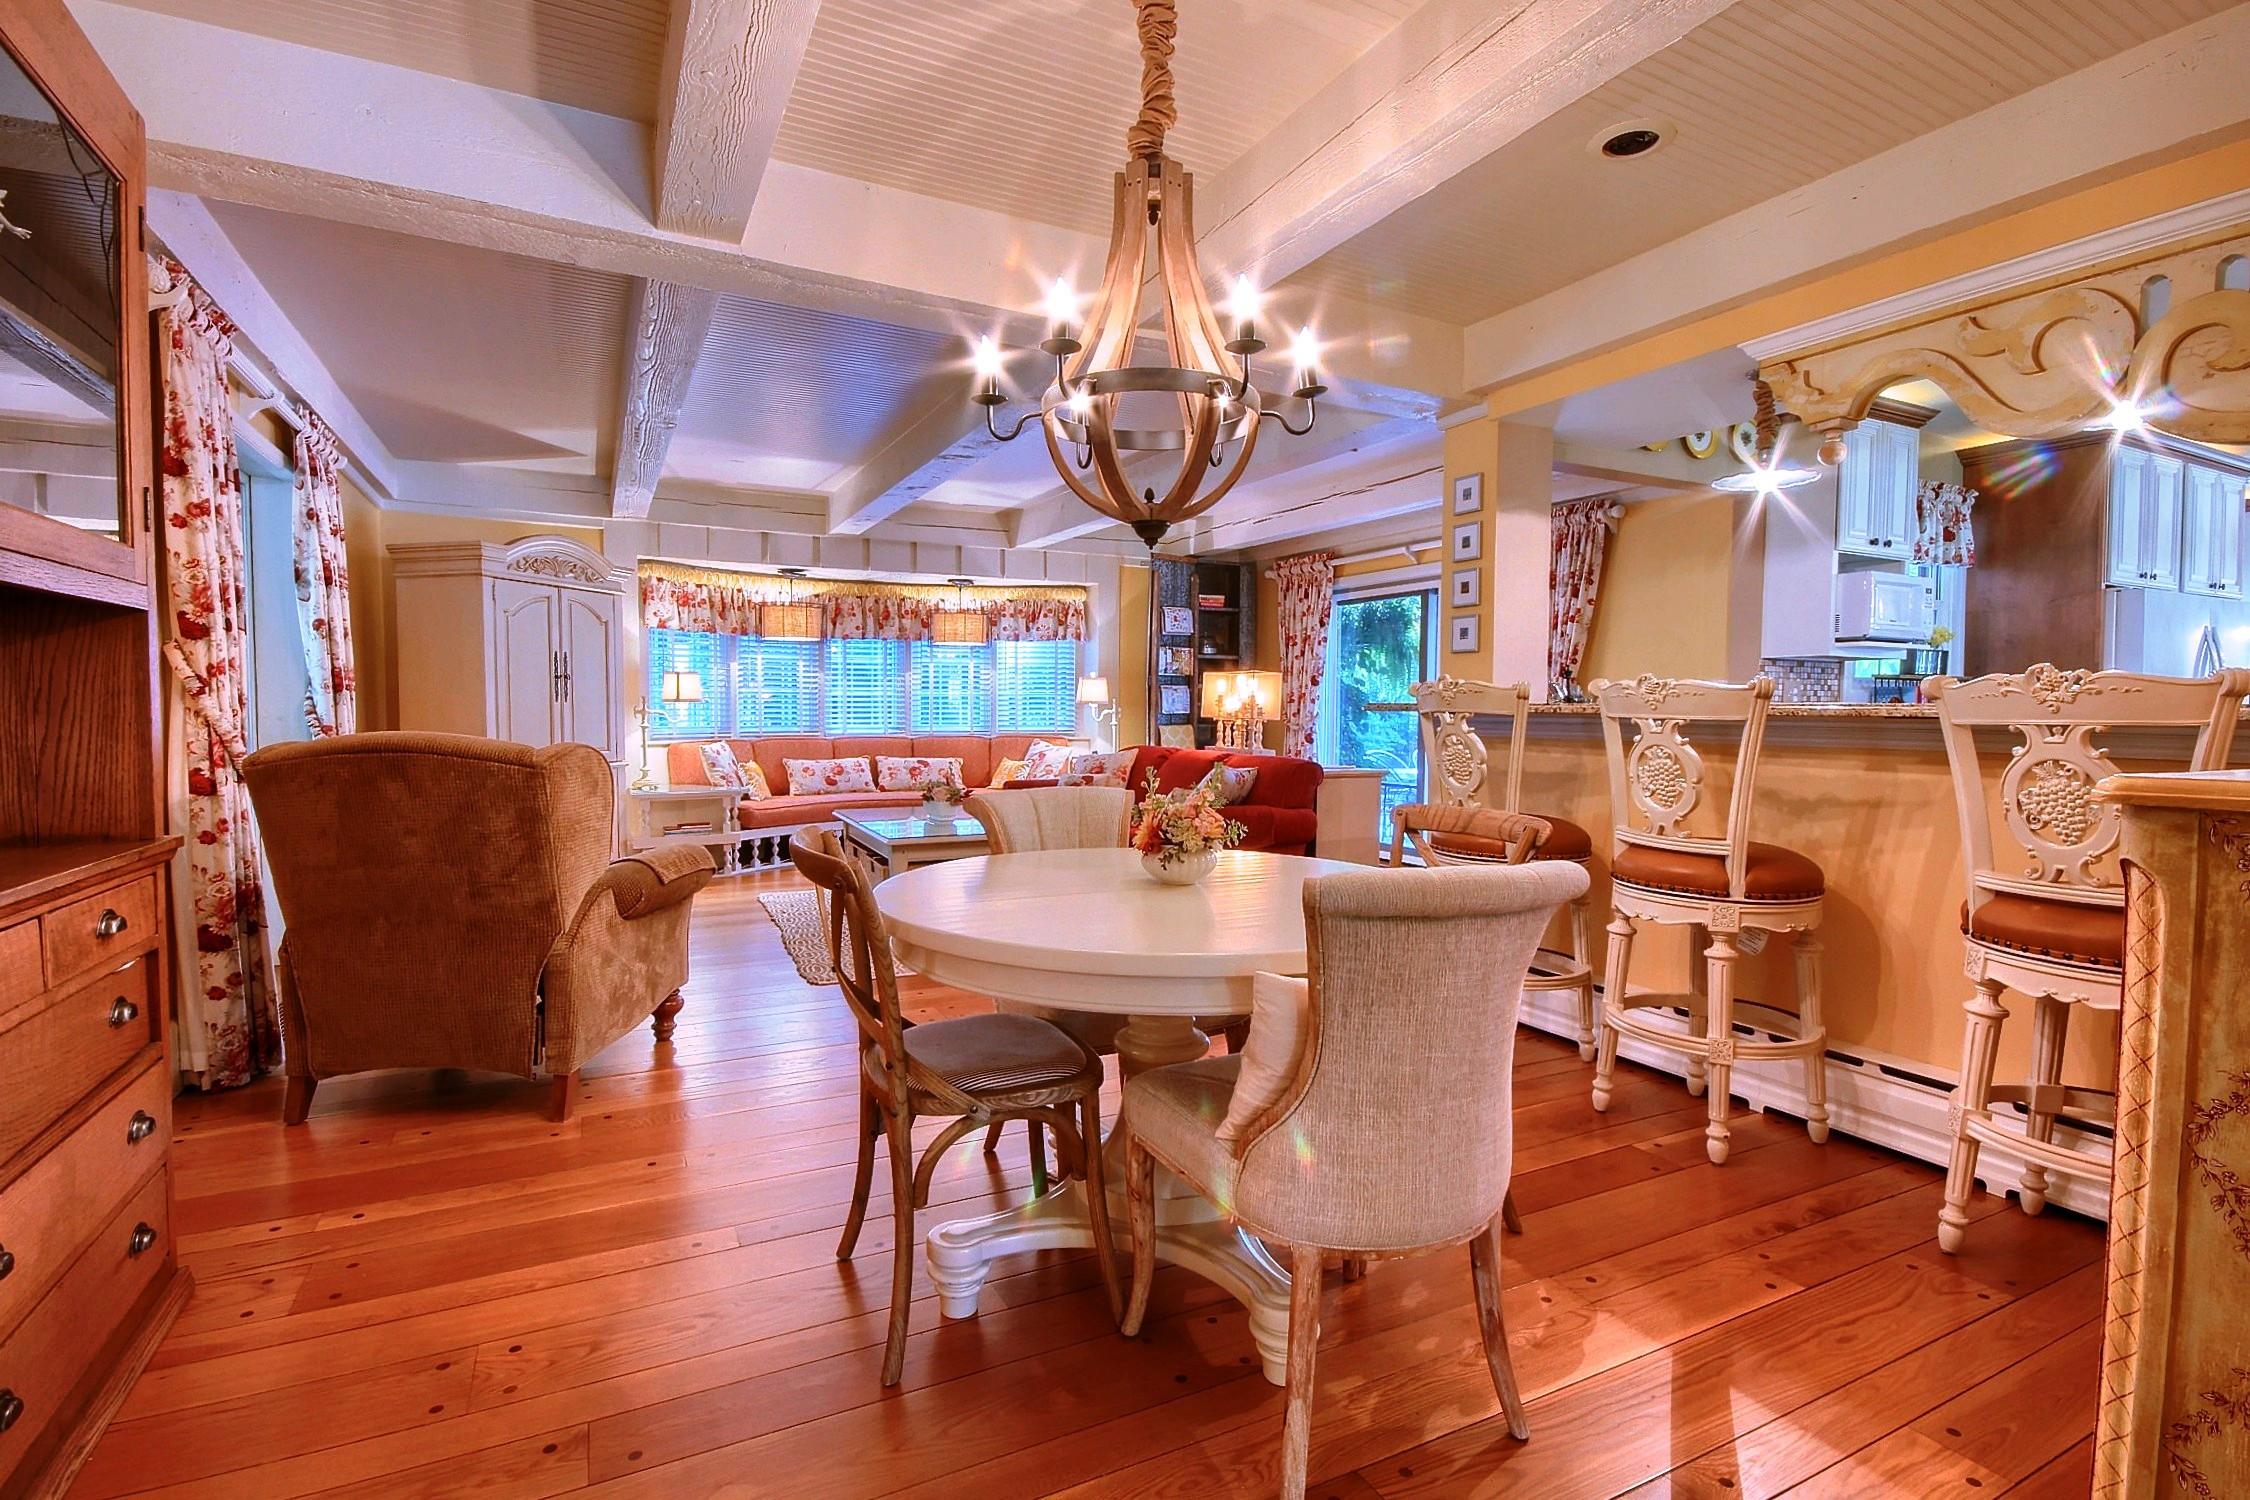 hardwood floor refinishing in livonia mi of kelly knight webster google throughout dining room